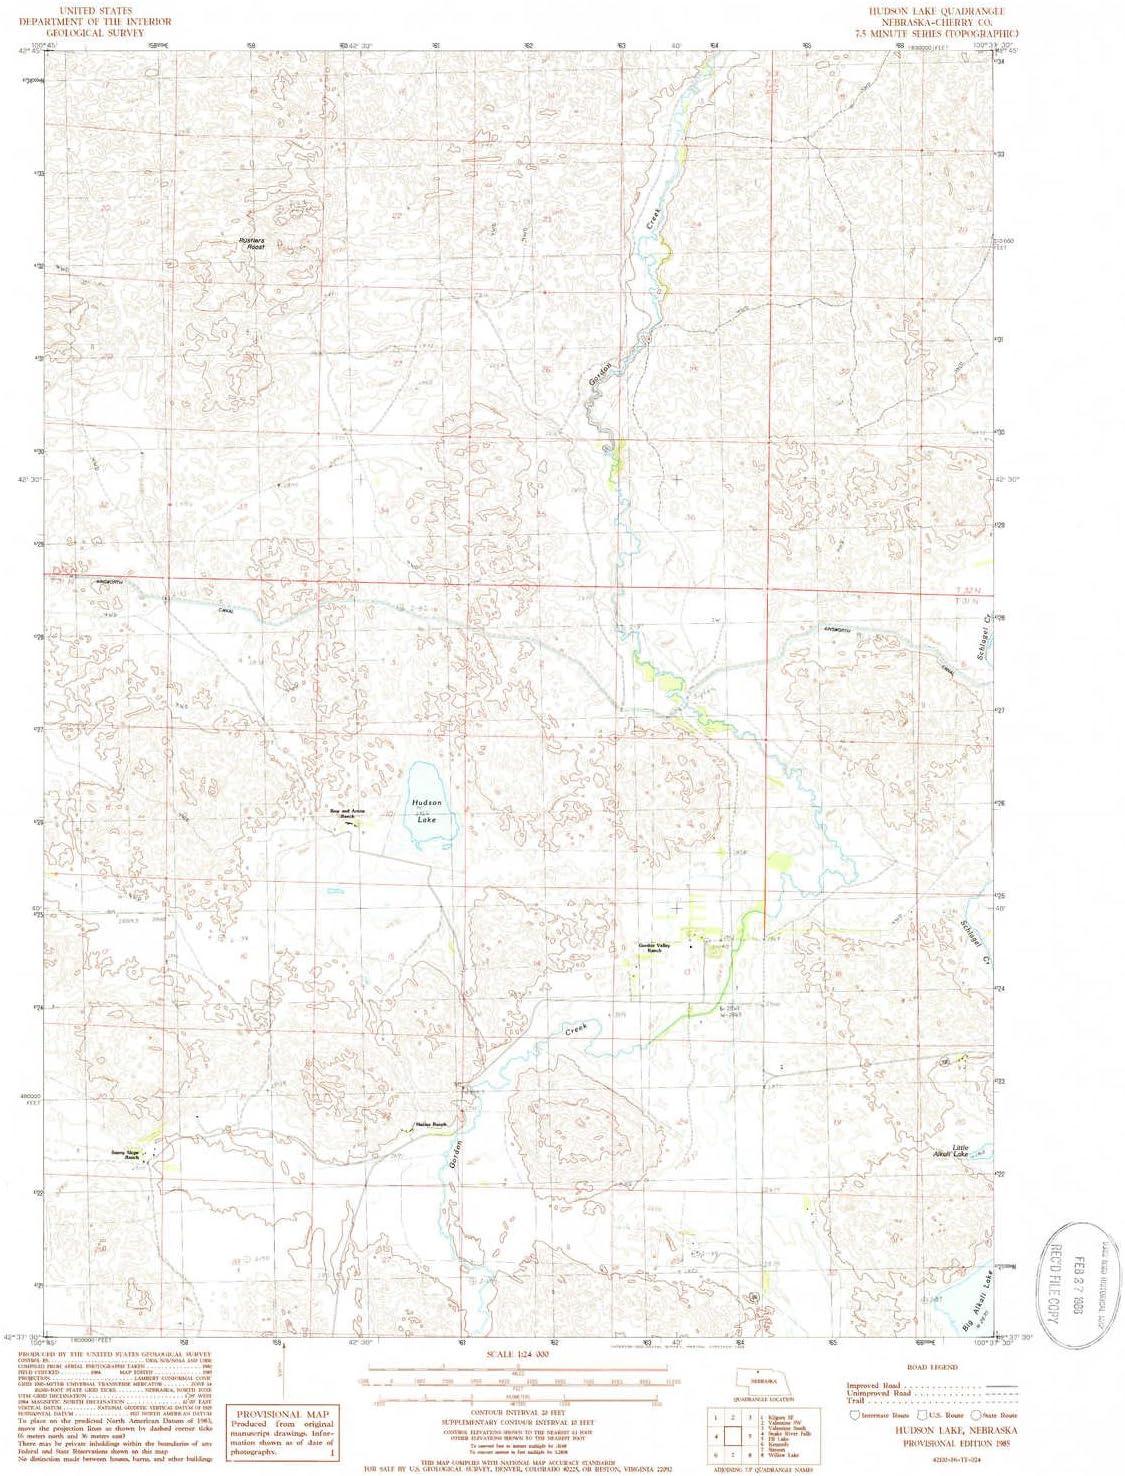 YellowMaps Hudson Lake free shipping NE topo map Special price Scale X Min 7.5 1:24000